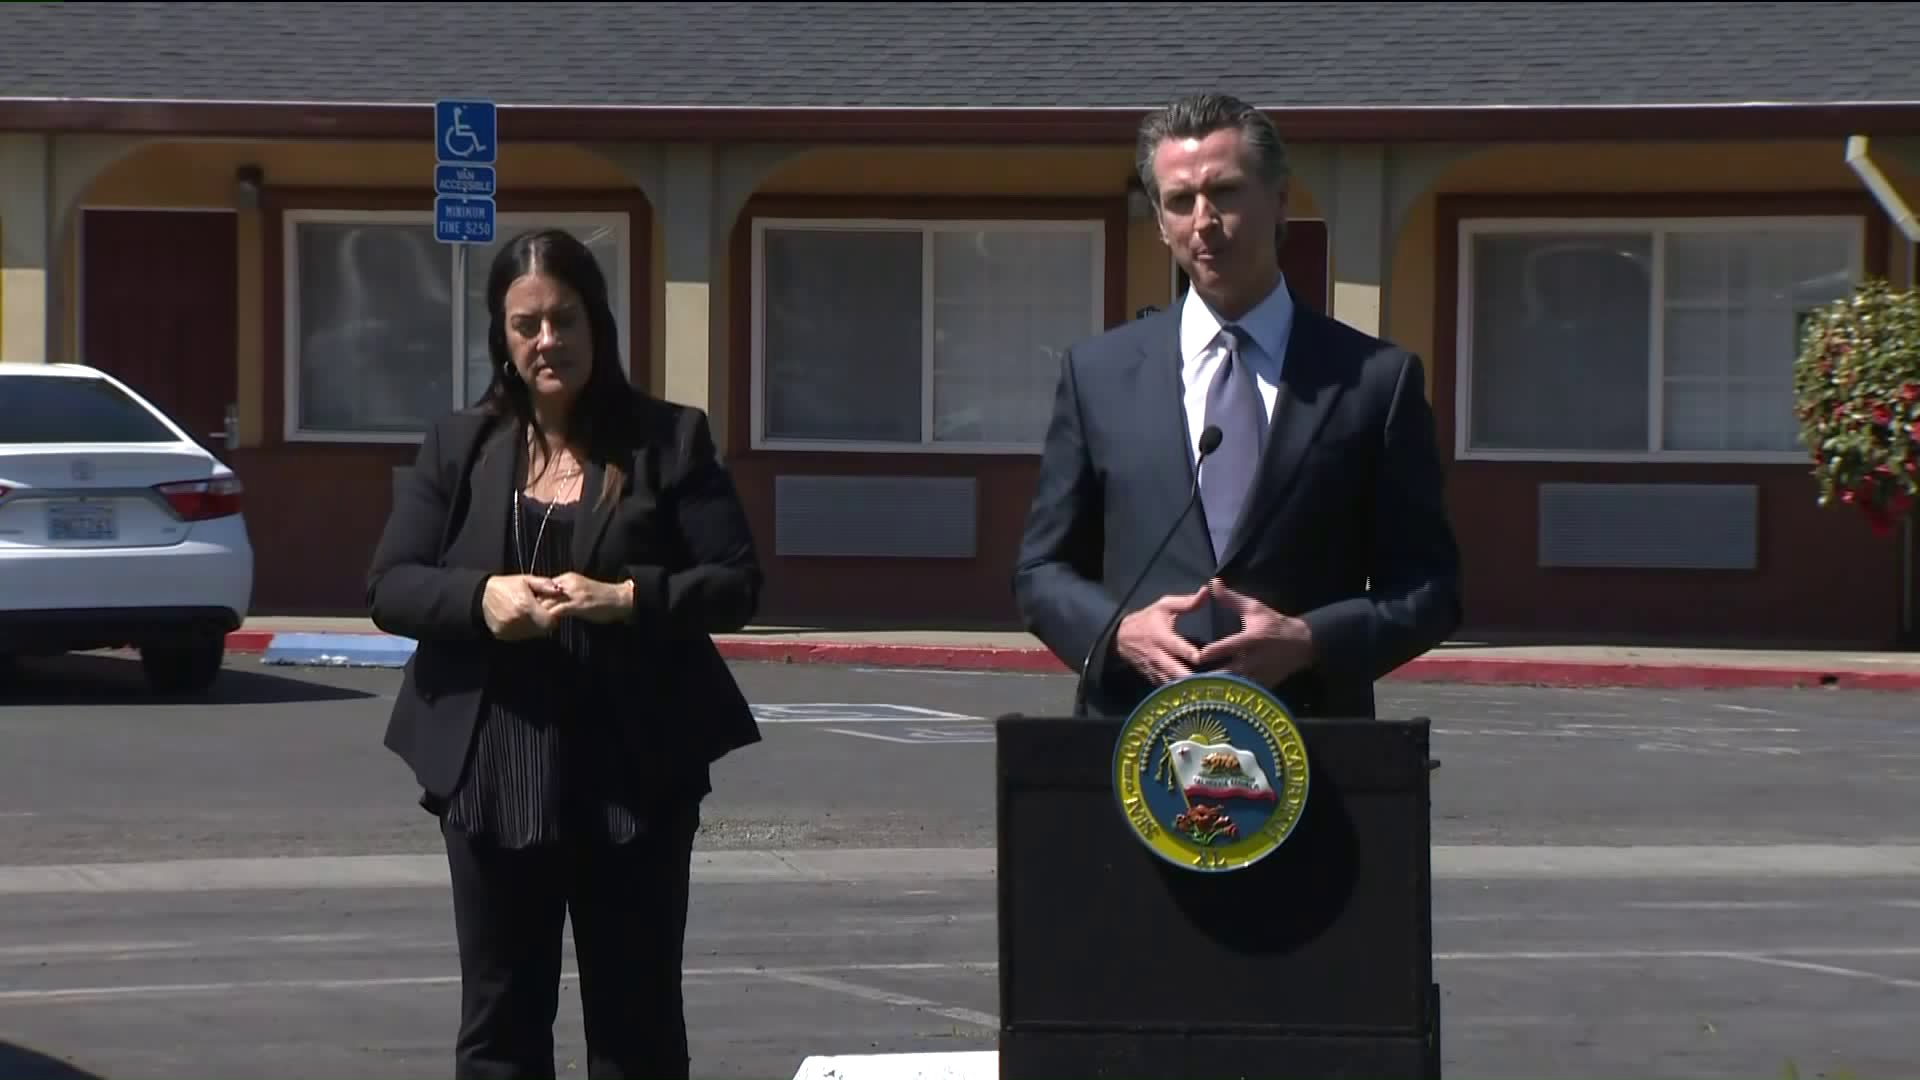 Gov. Gavin Newsom speaks at a news conference in Sacramento on April 3, 2020. (Pool)